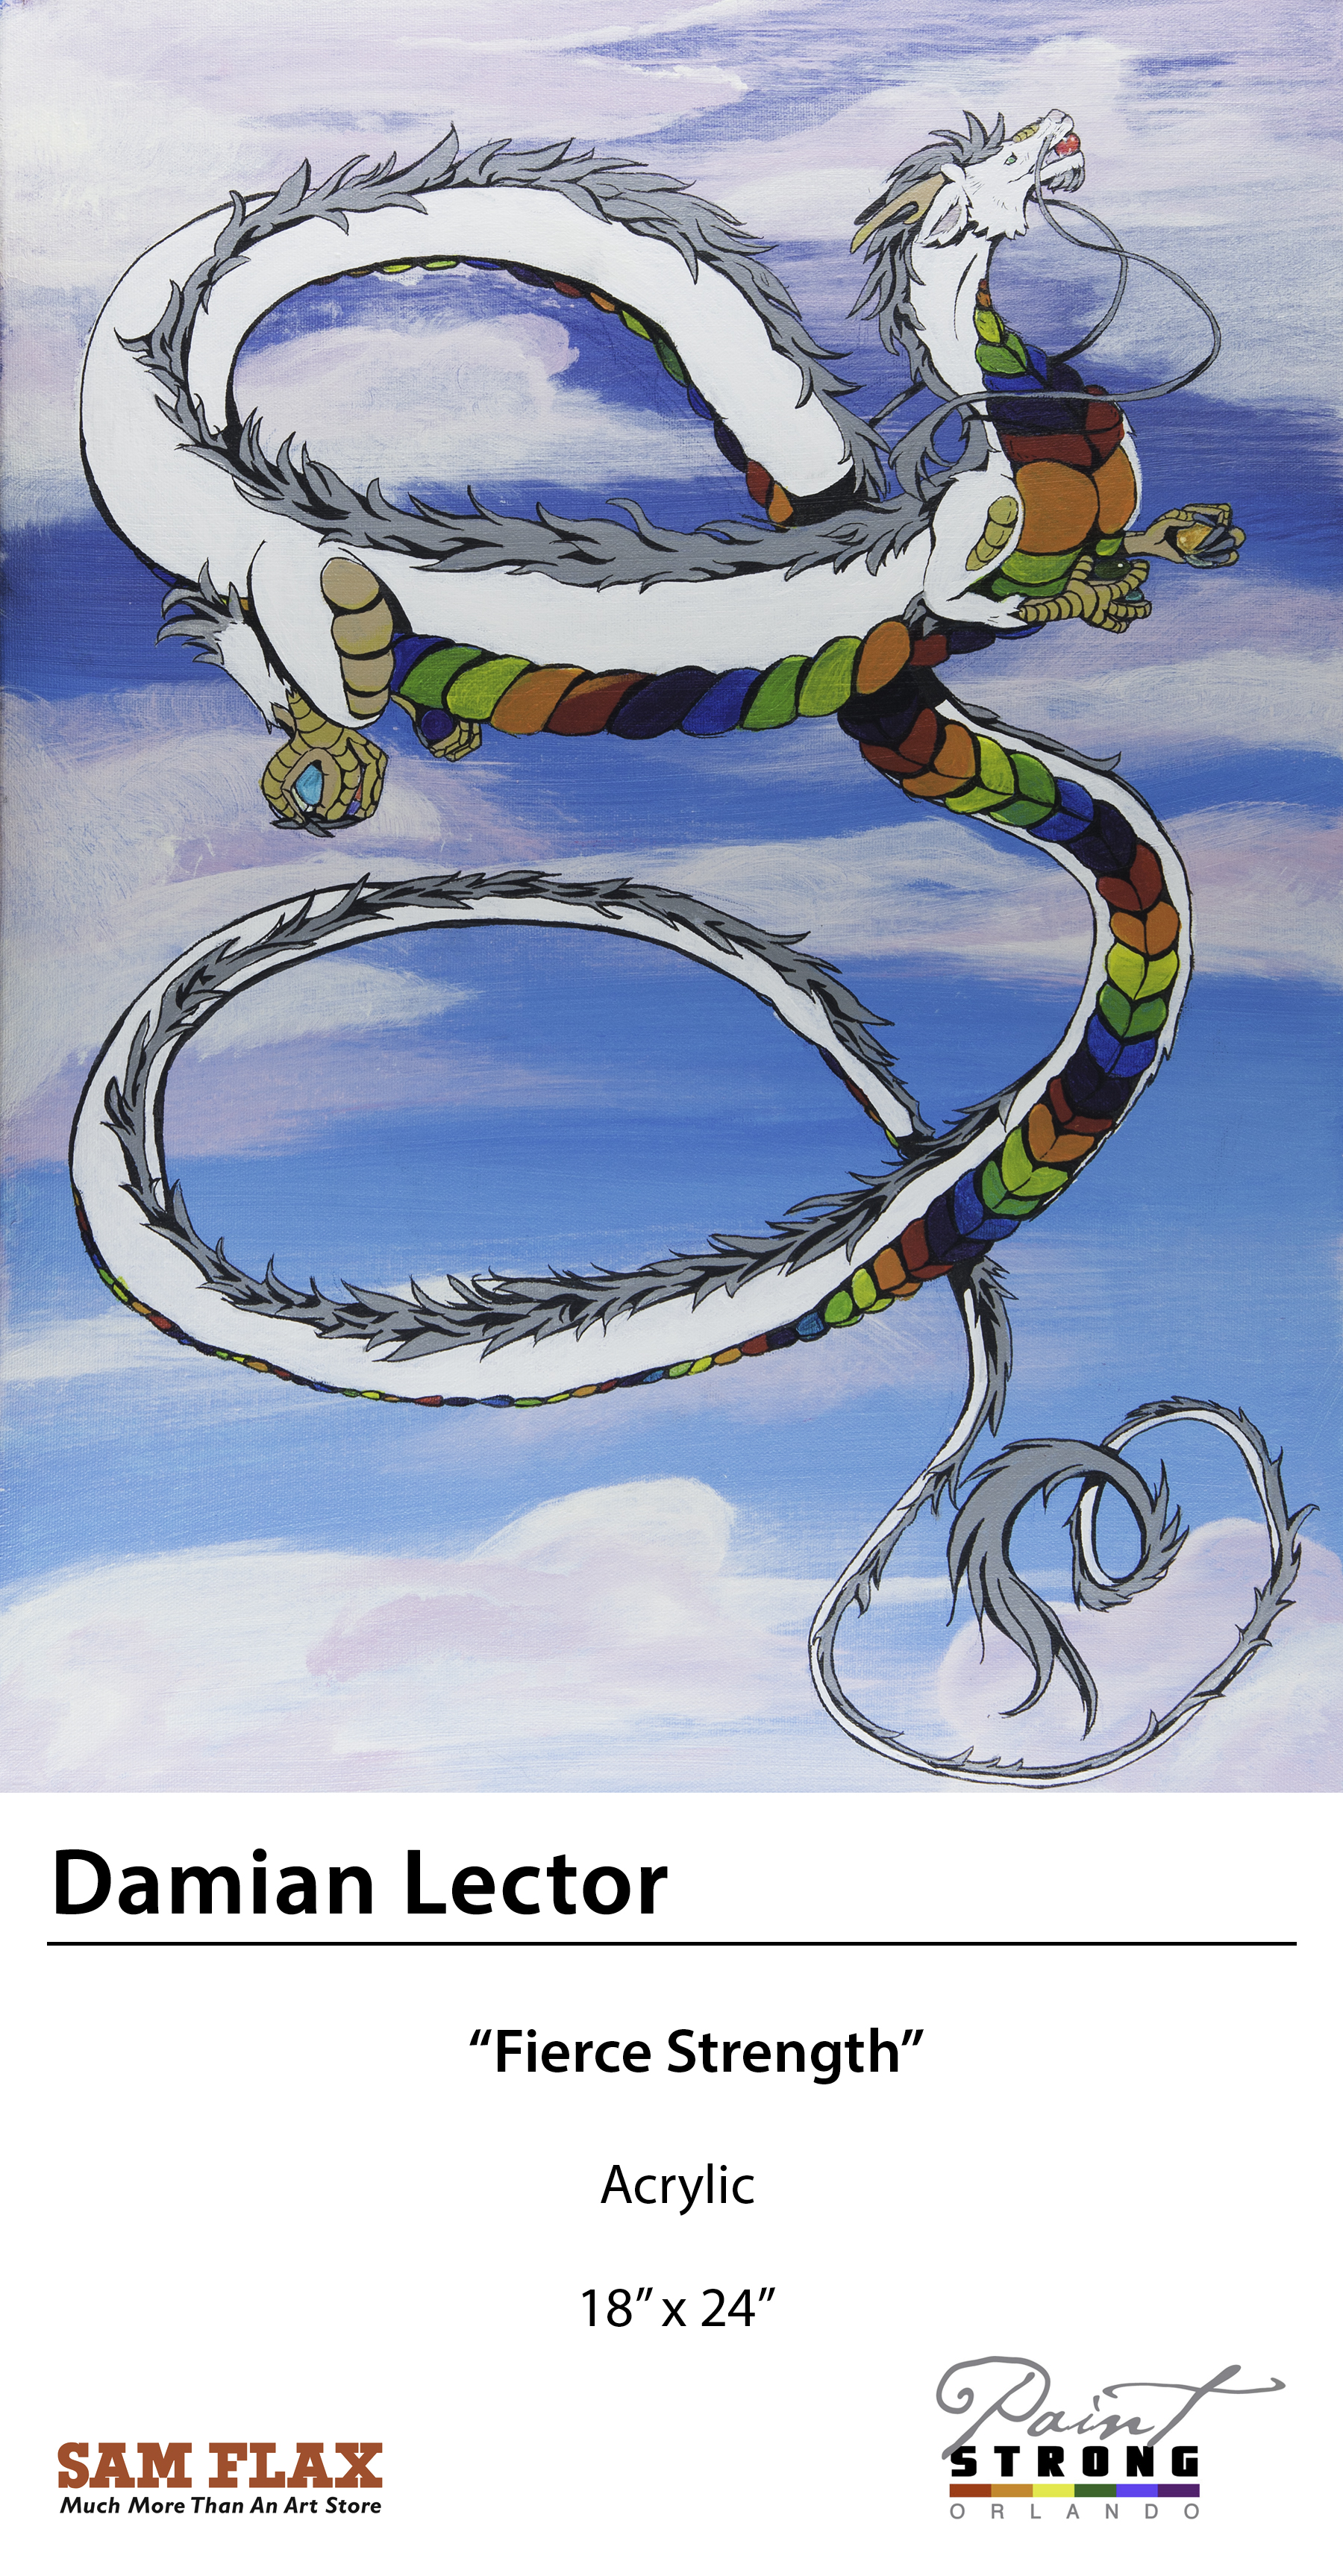 Damian Lector